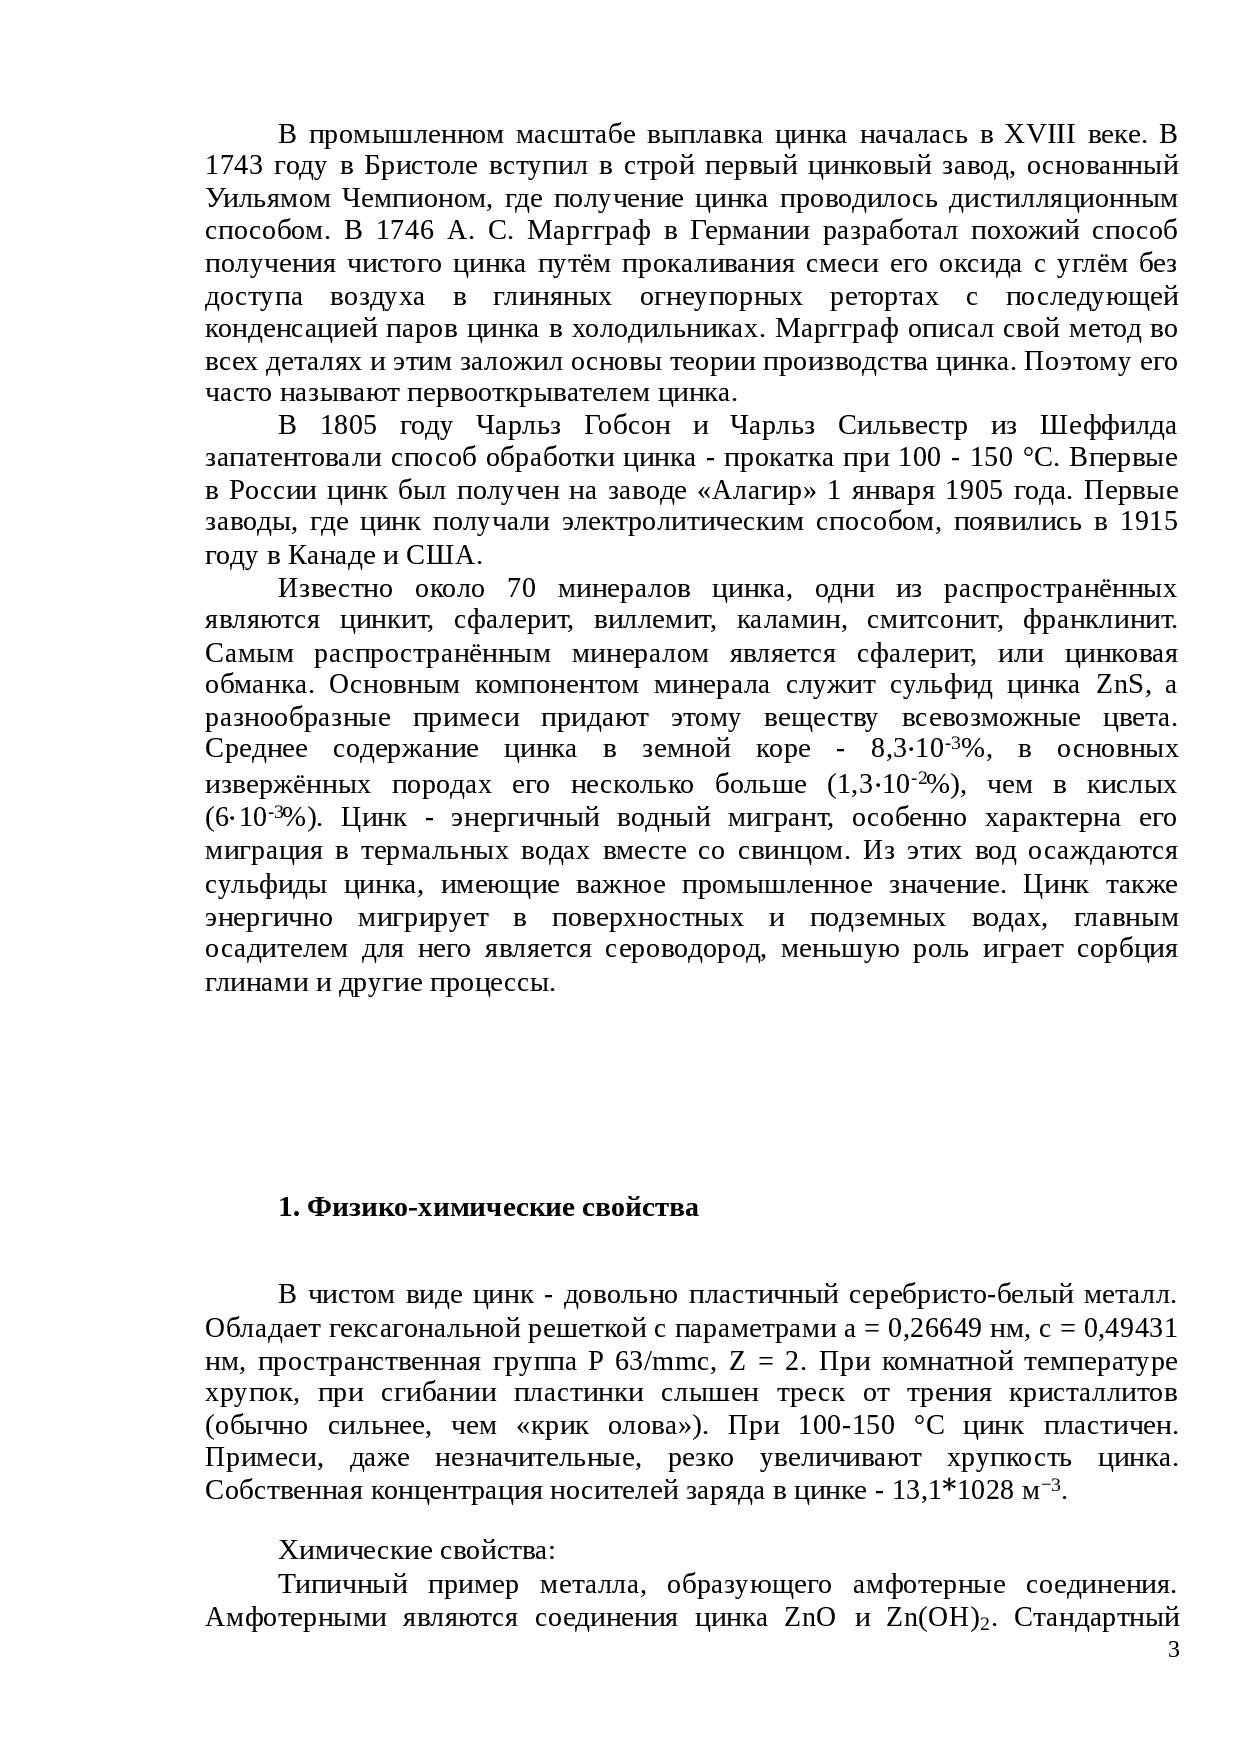 Цинк. соединения цинка. амфотерность оксида и гидроксида цинка.